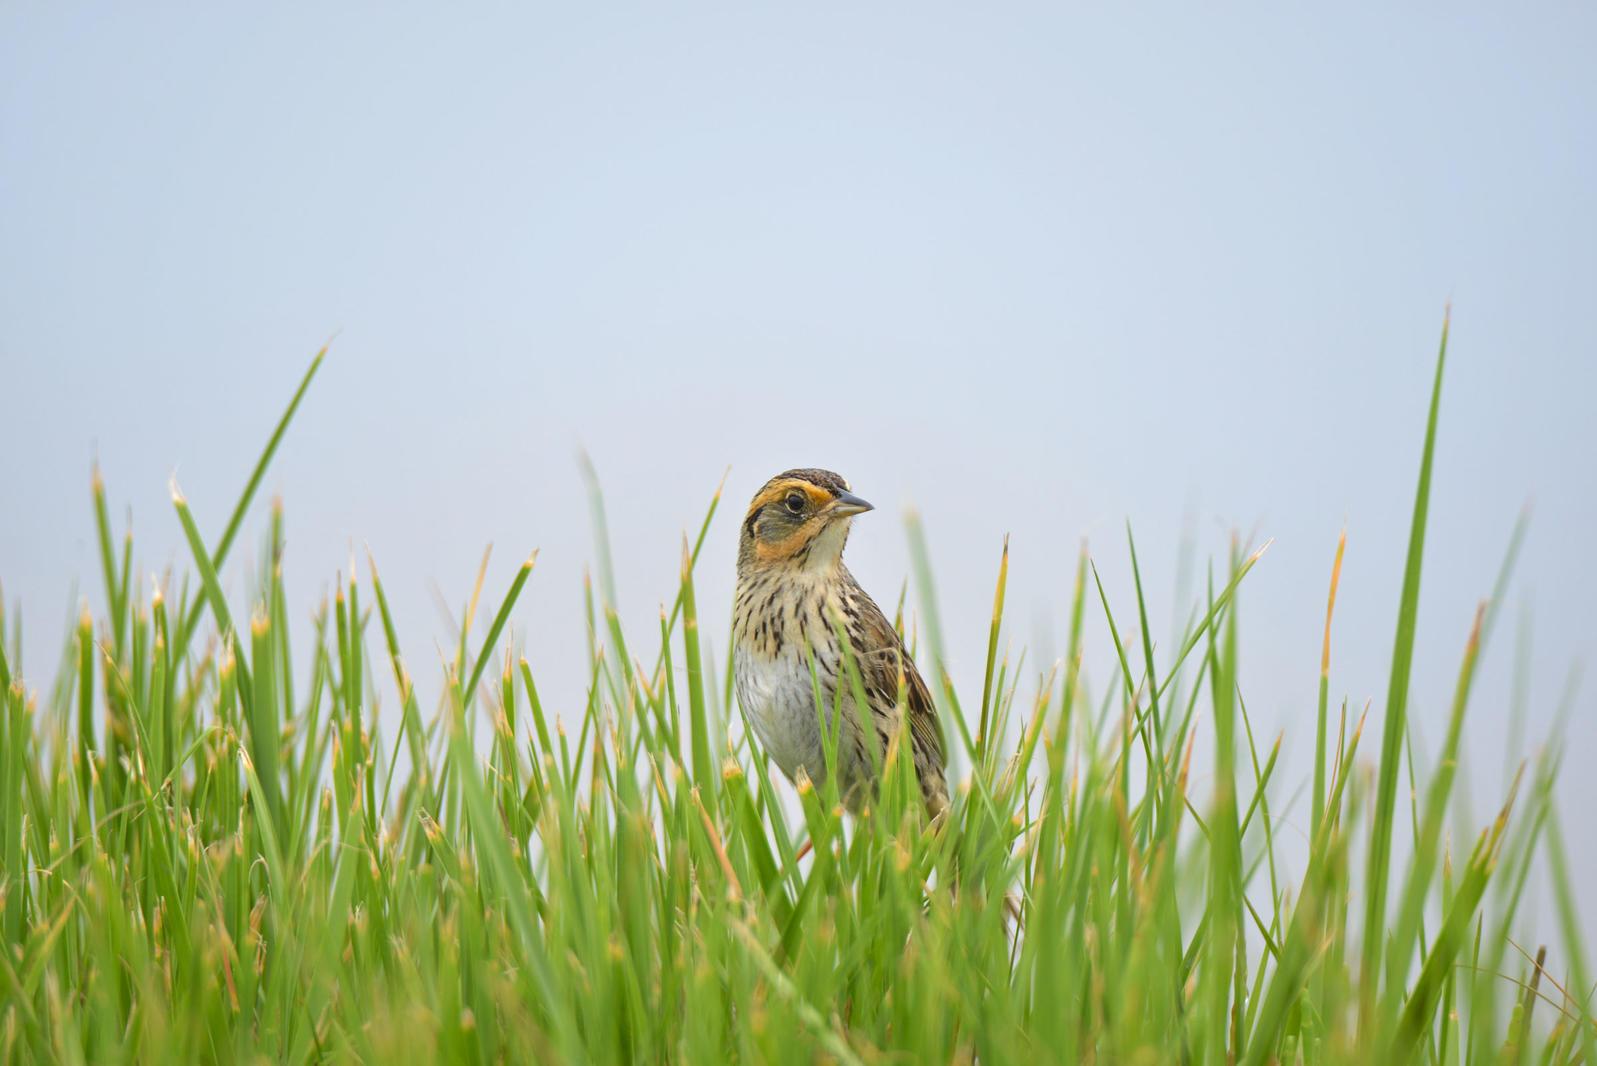 Saltmarsh Sparrow. Joesboy/iStock